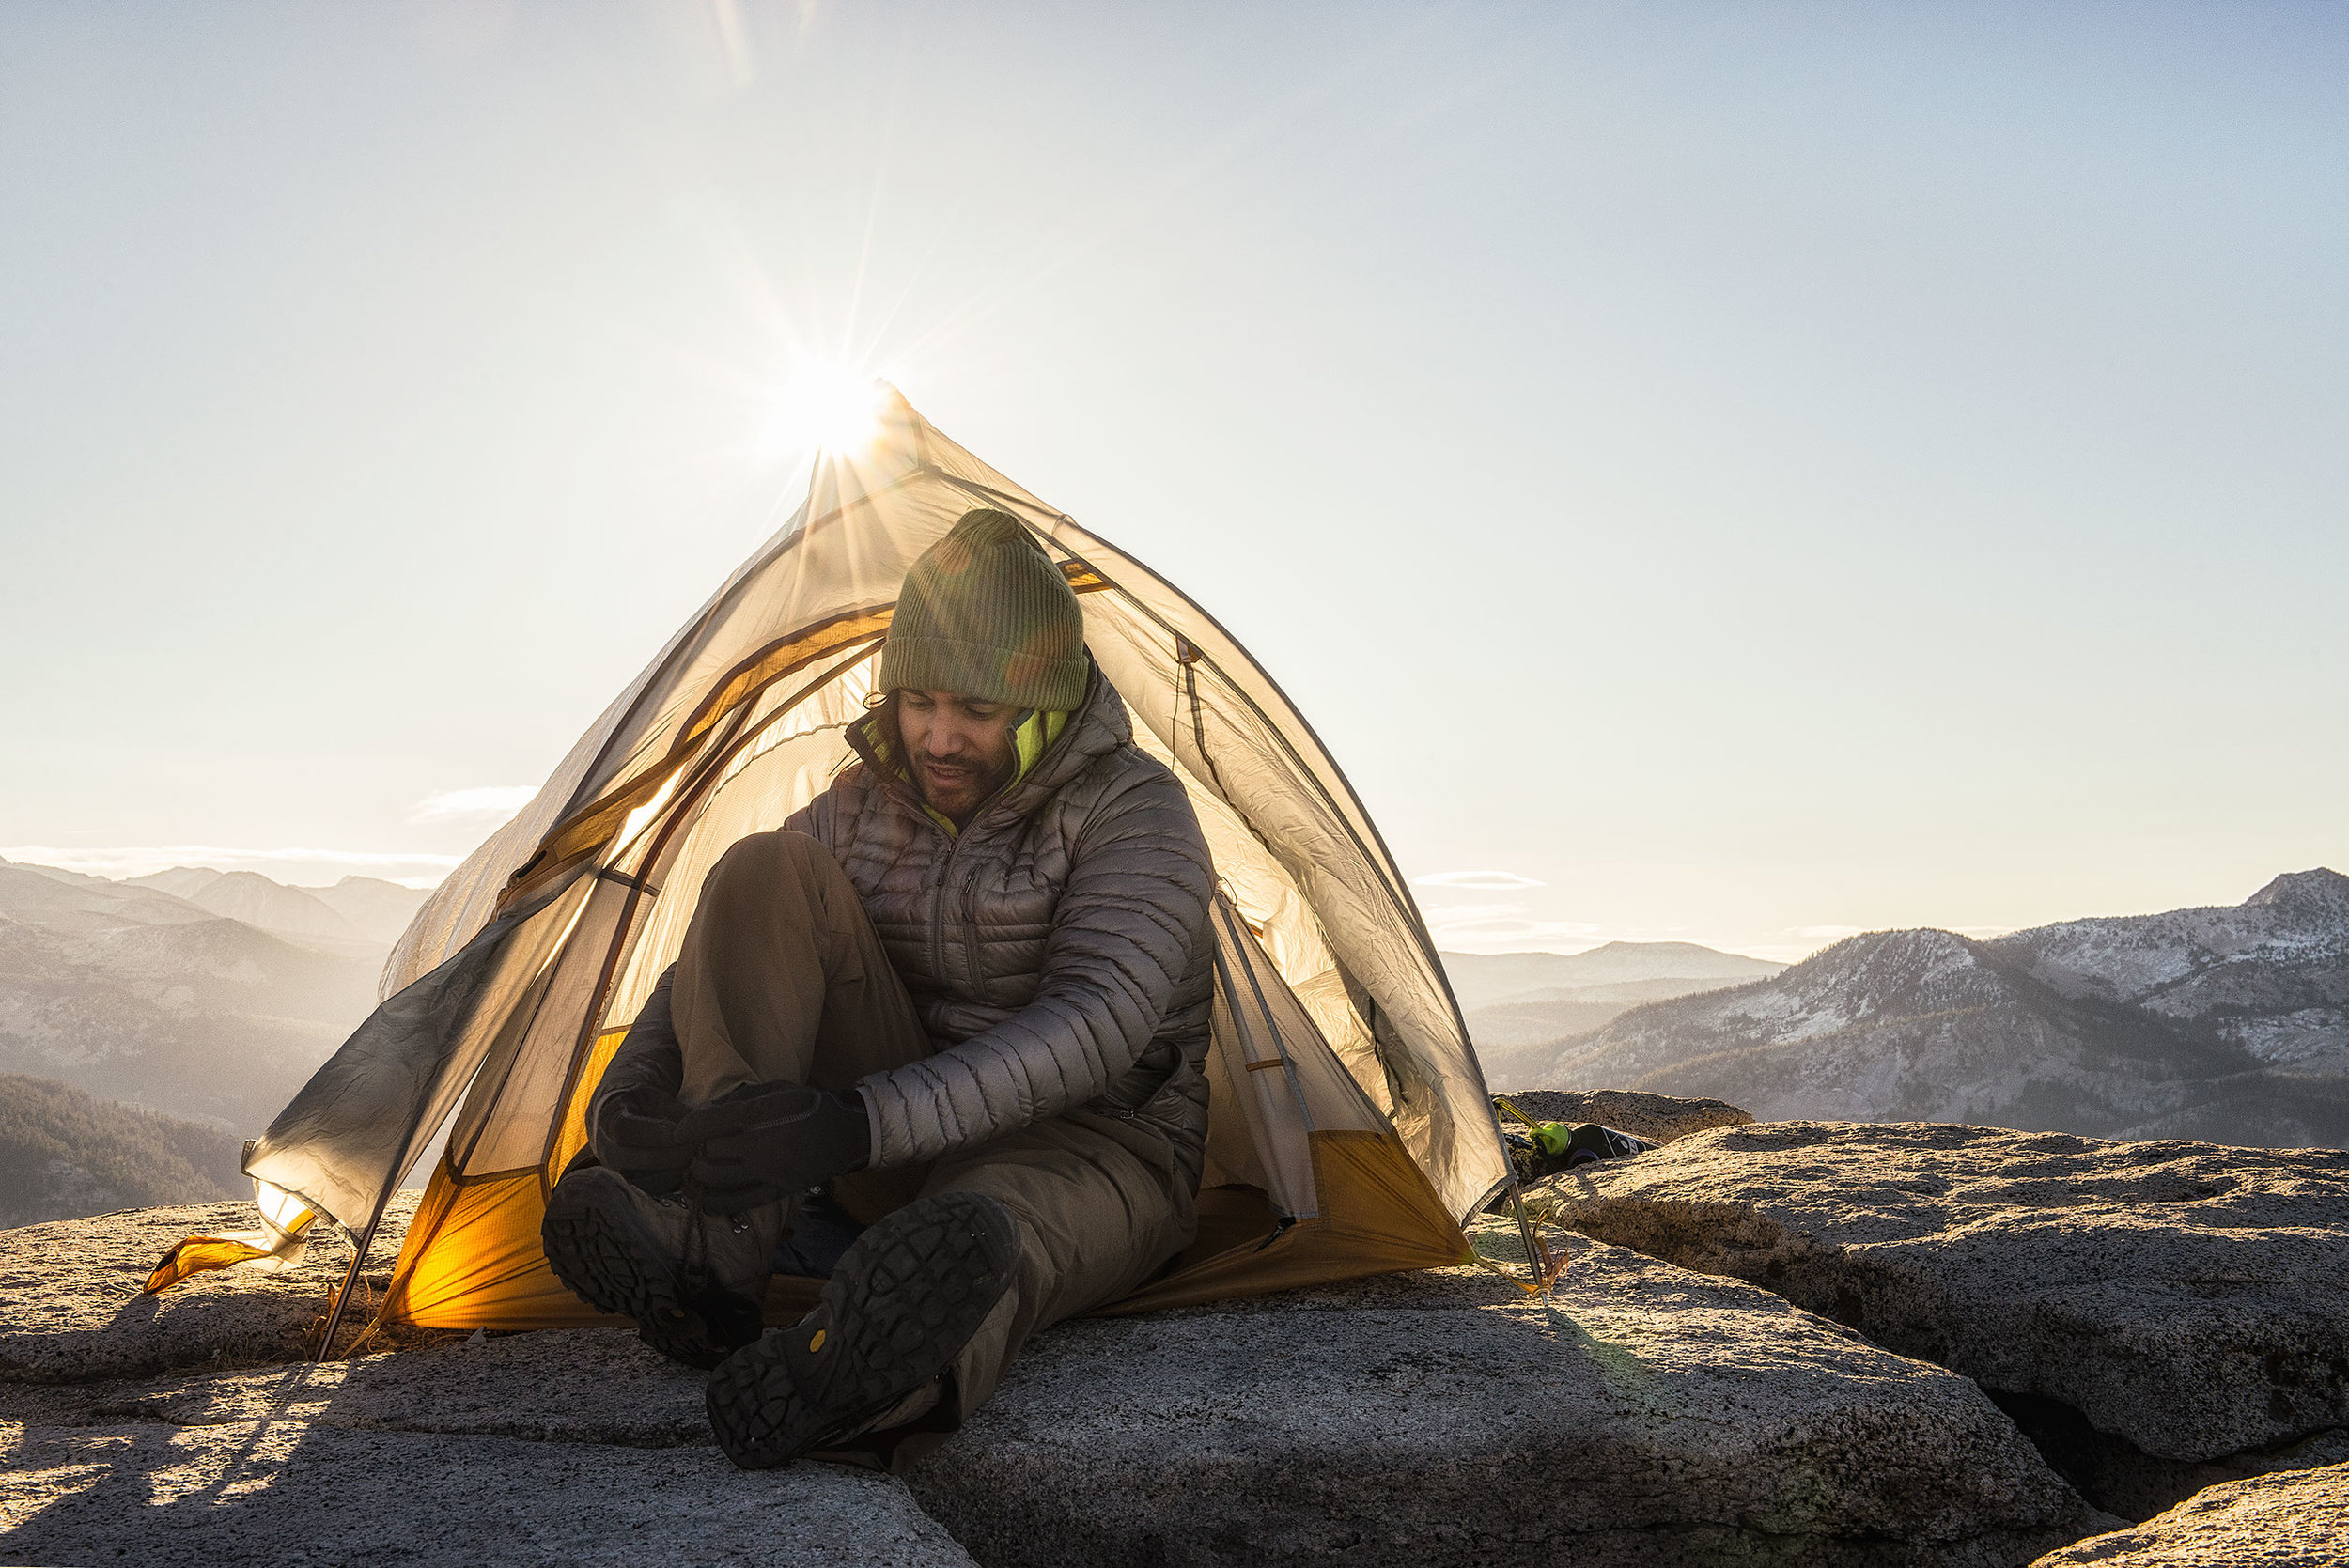 austin-trigg-yosemite-national-park-tent-camping-california-clouds-rest-mountains.jpg